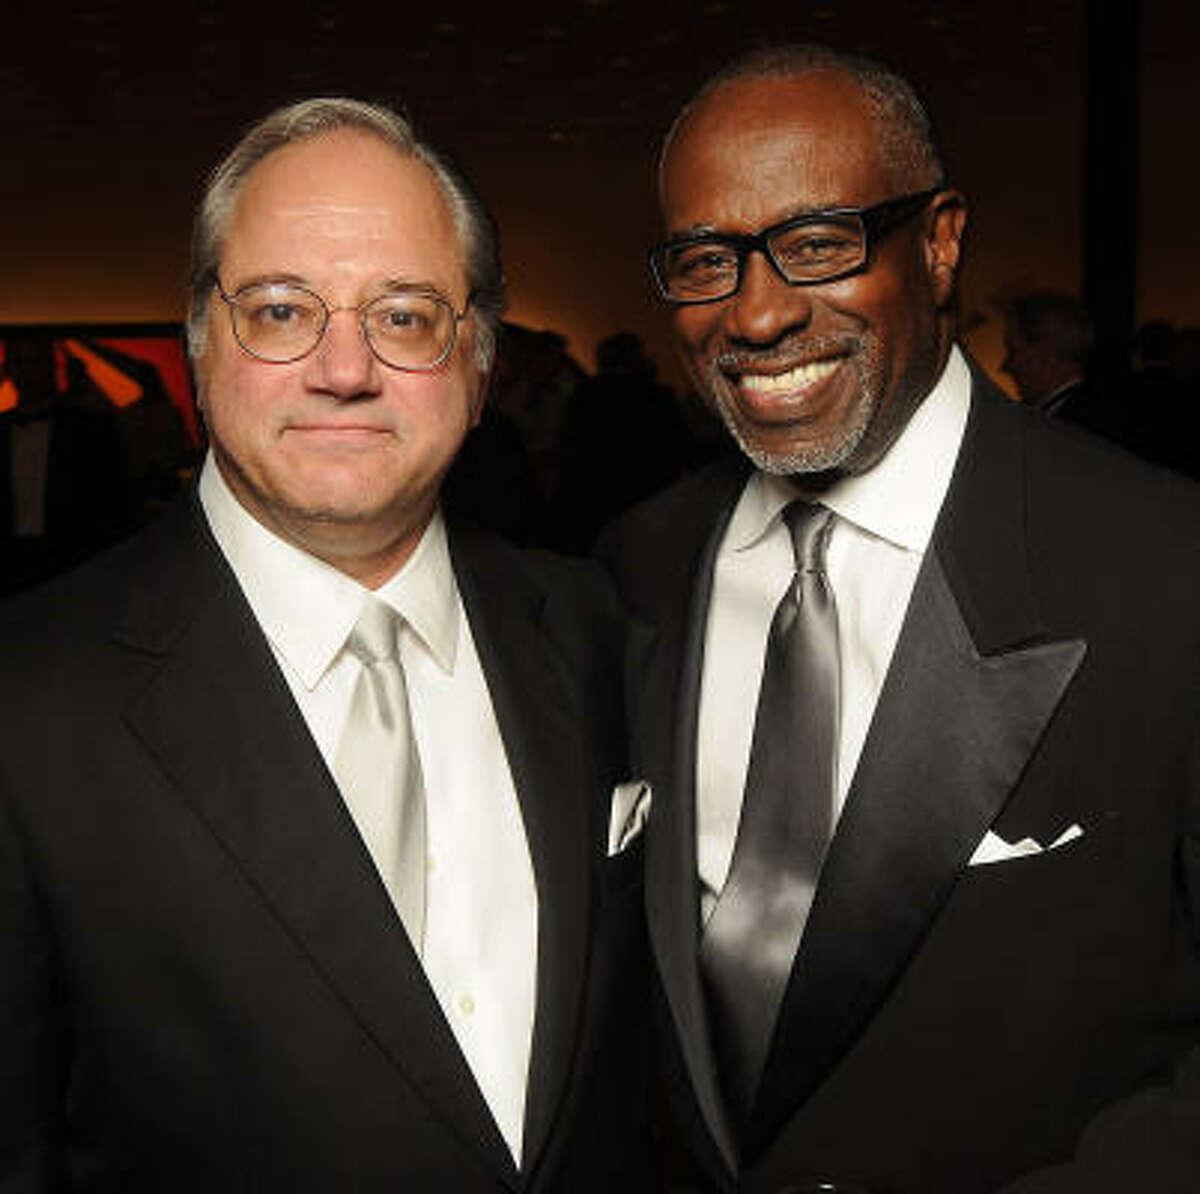 Anthony Petrello, left, and Gerald Smith